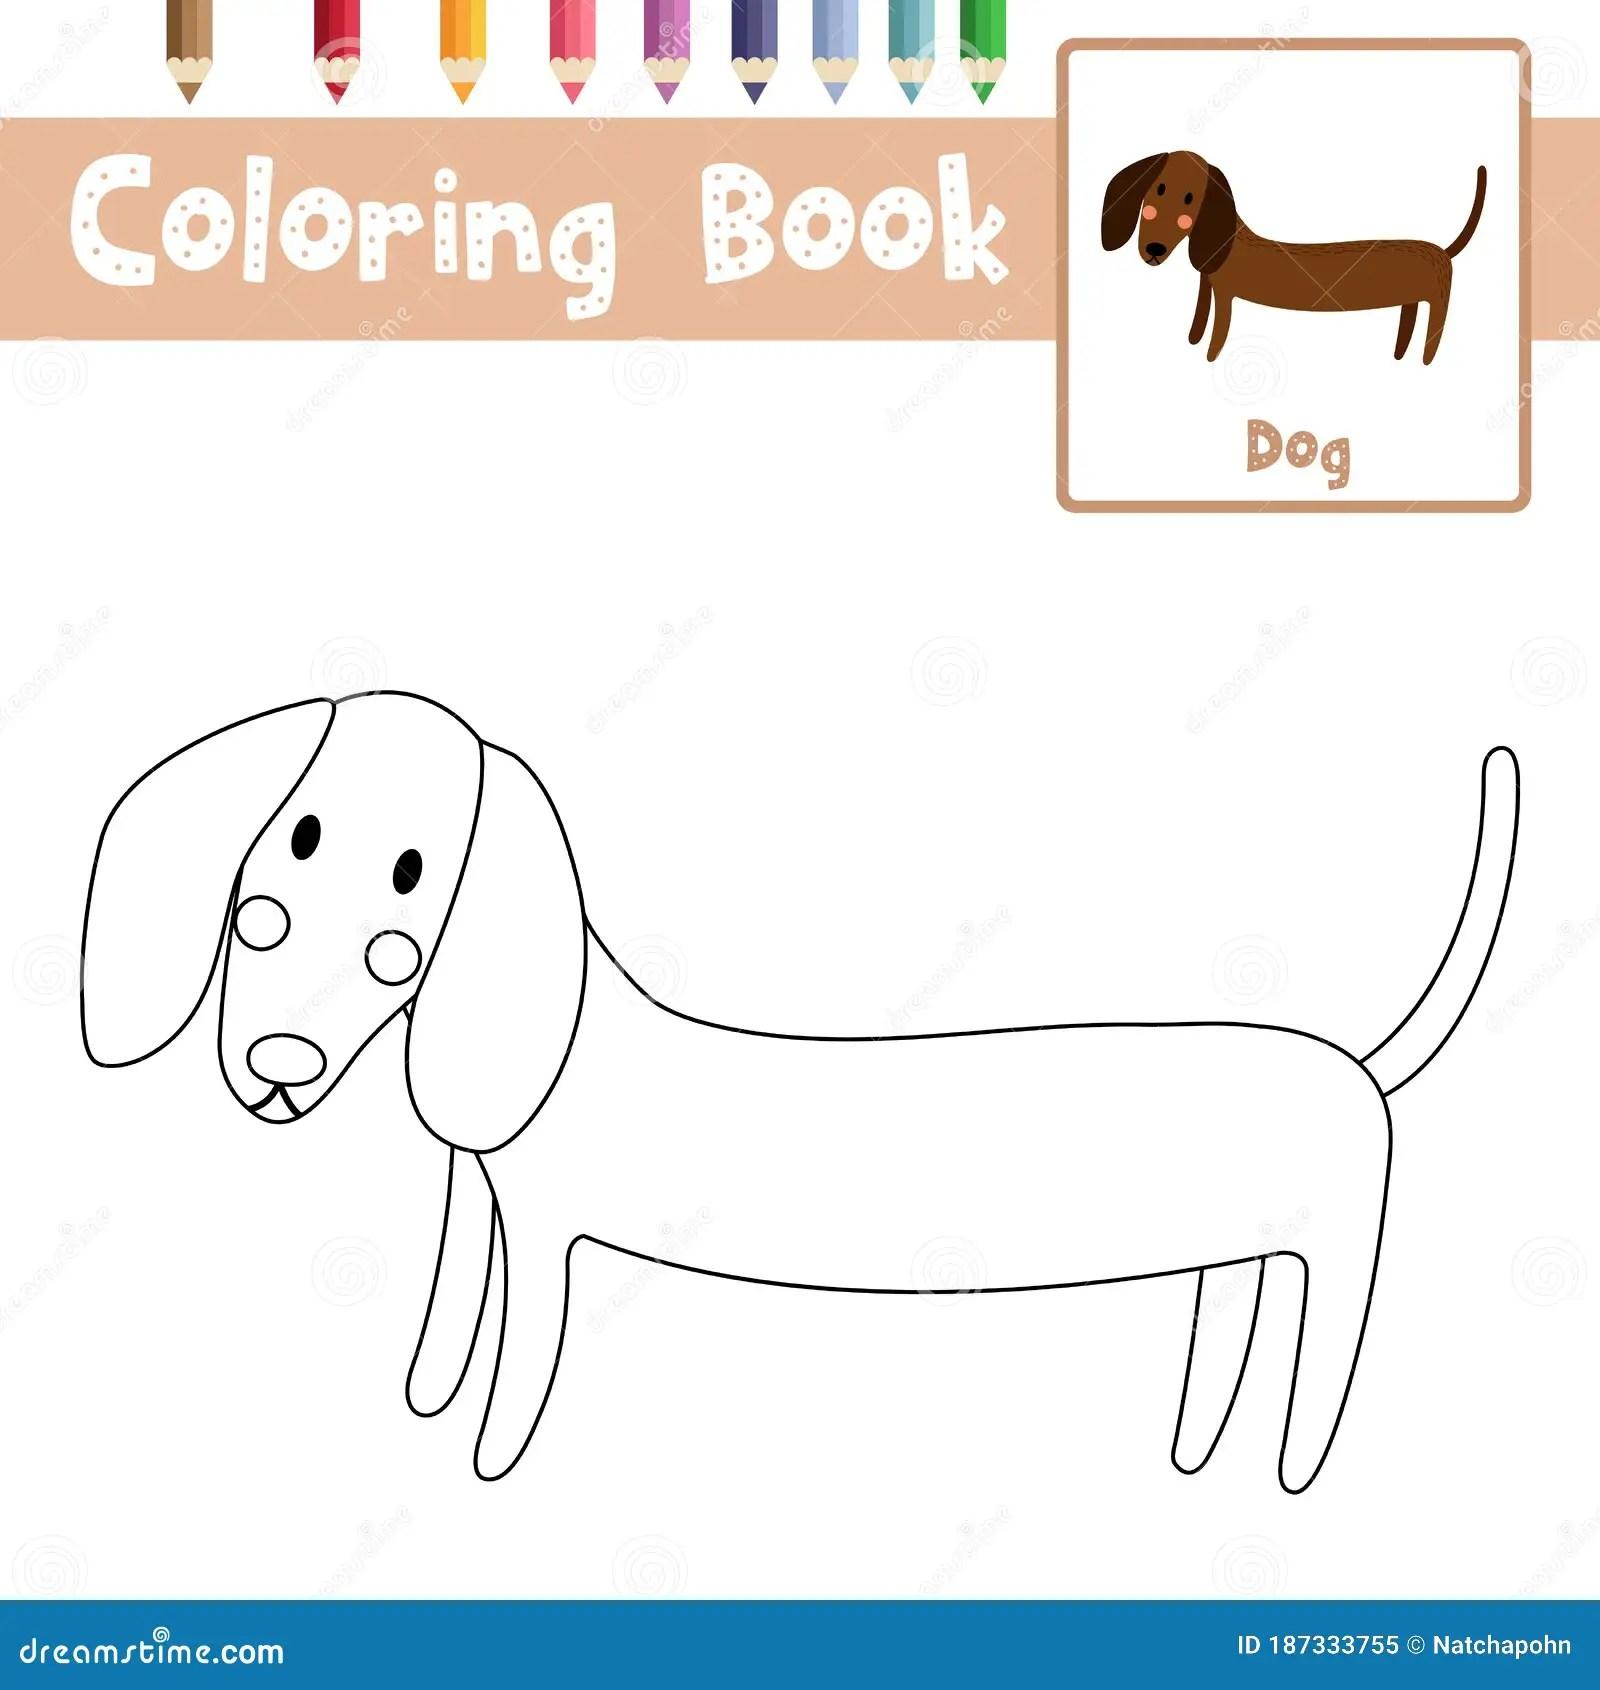 Coloring Page Dachshund Animal Cartoon Character Vector